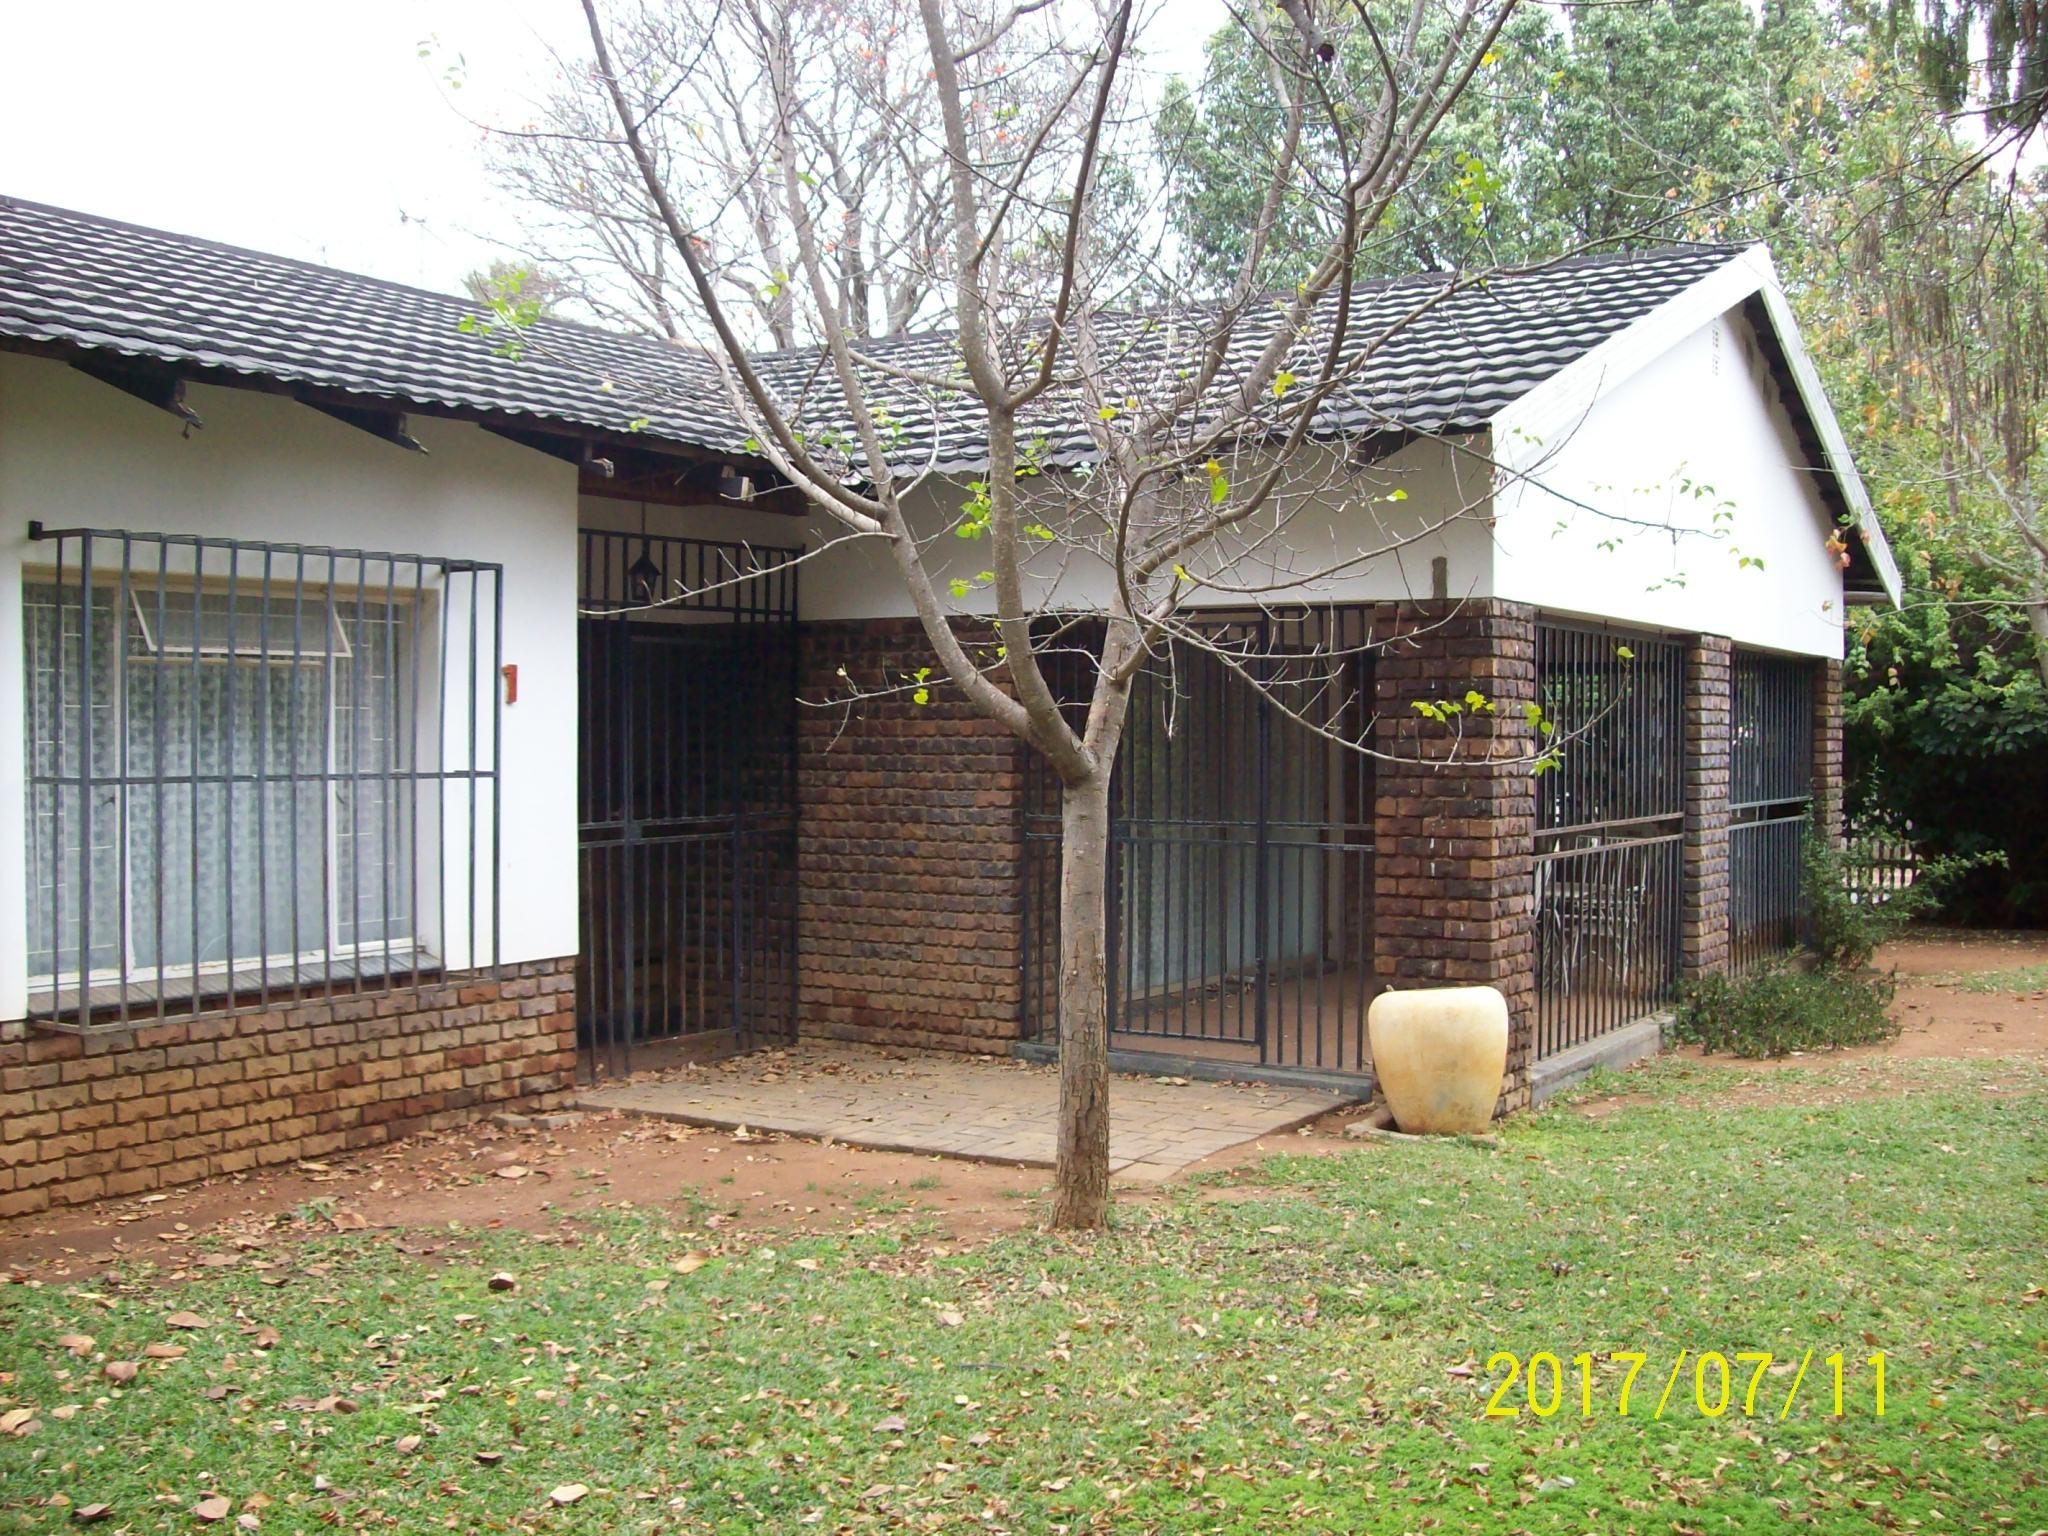 3 Bedroom , 2 bathroom house in fauna park